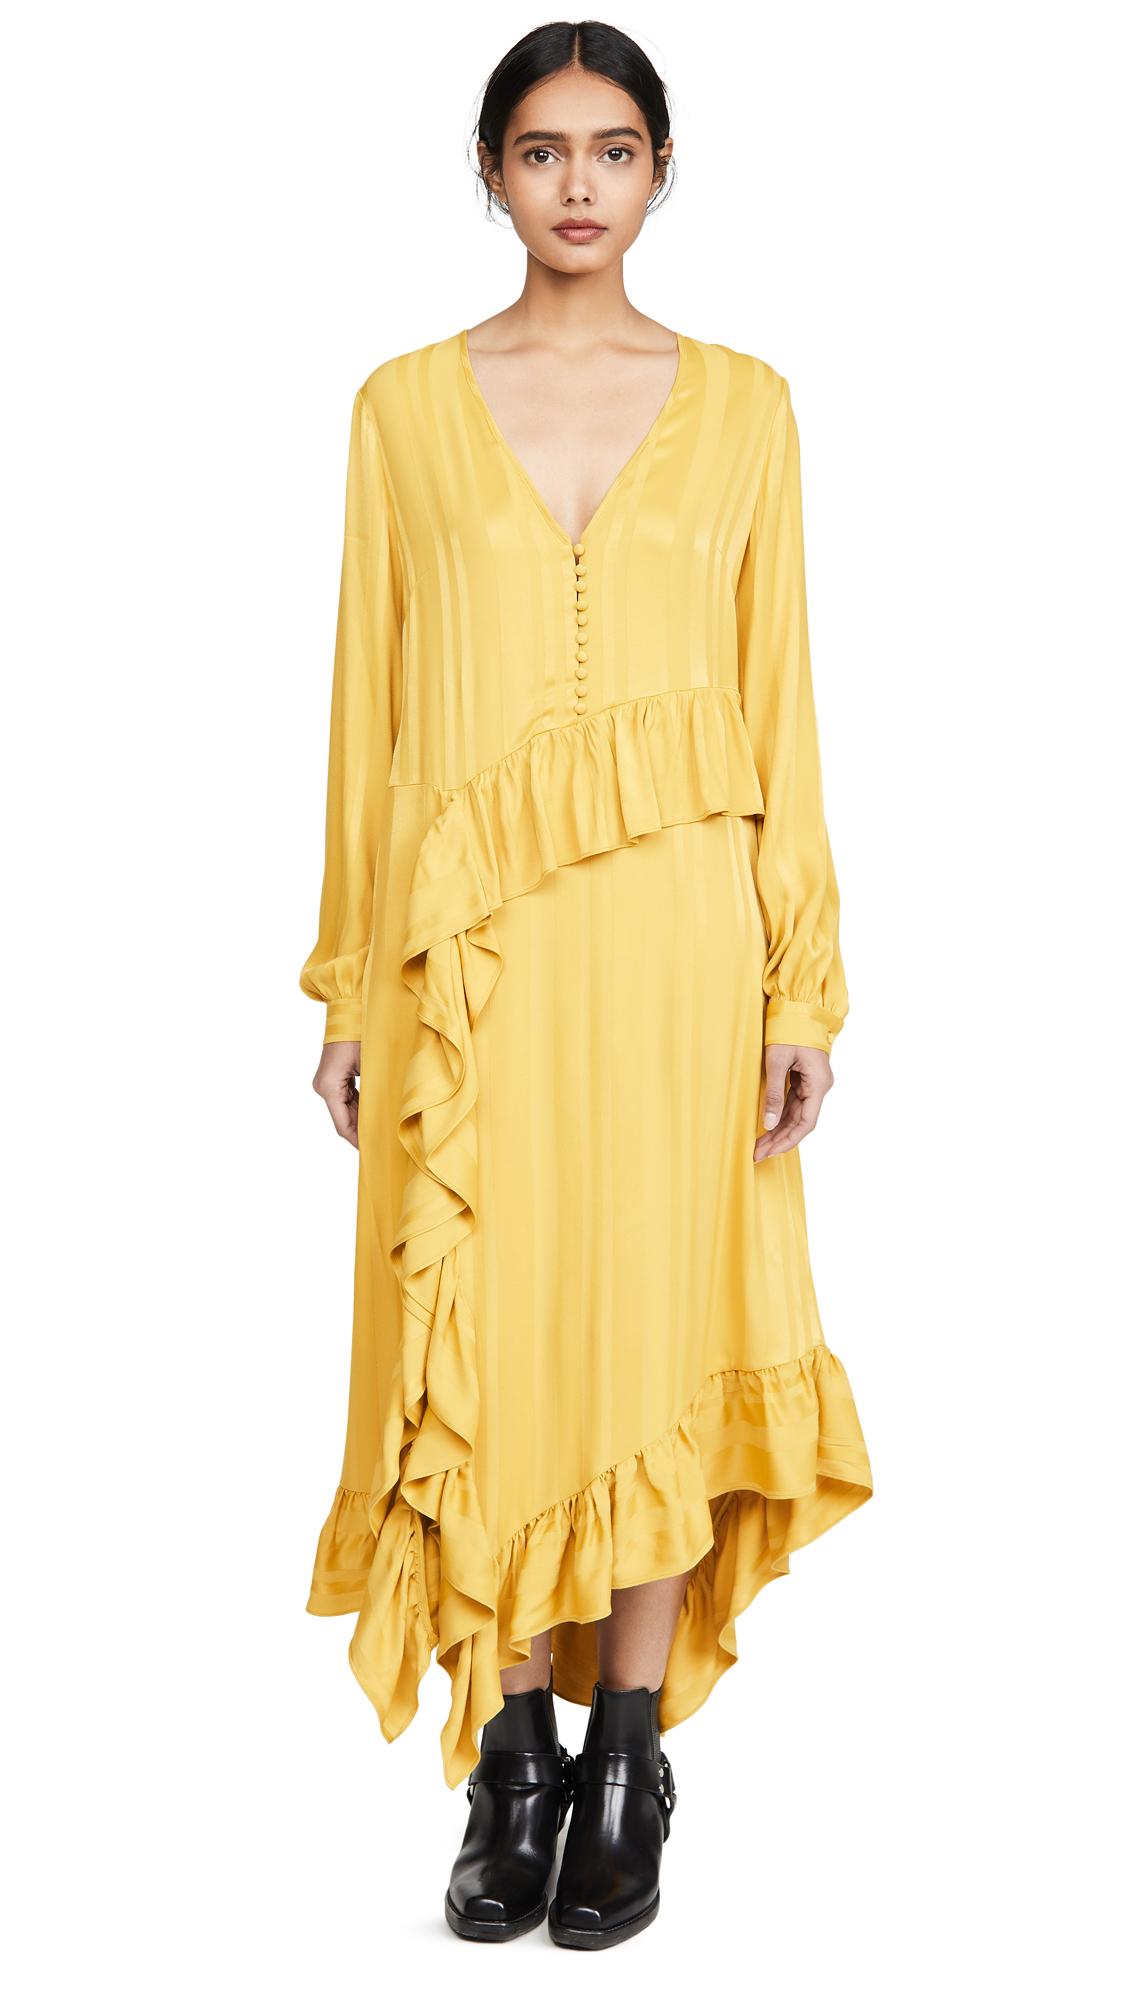 Photo of Hofmann Copenhagen Josie Dress - shop Hofmann Copenhagen Clothing, Dresses online